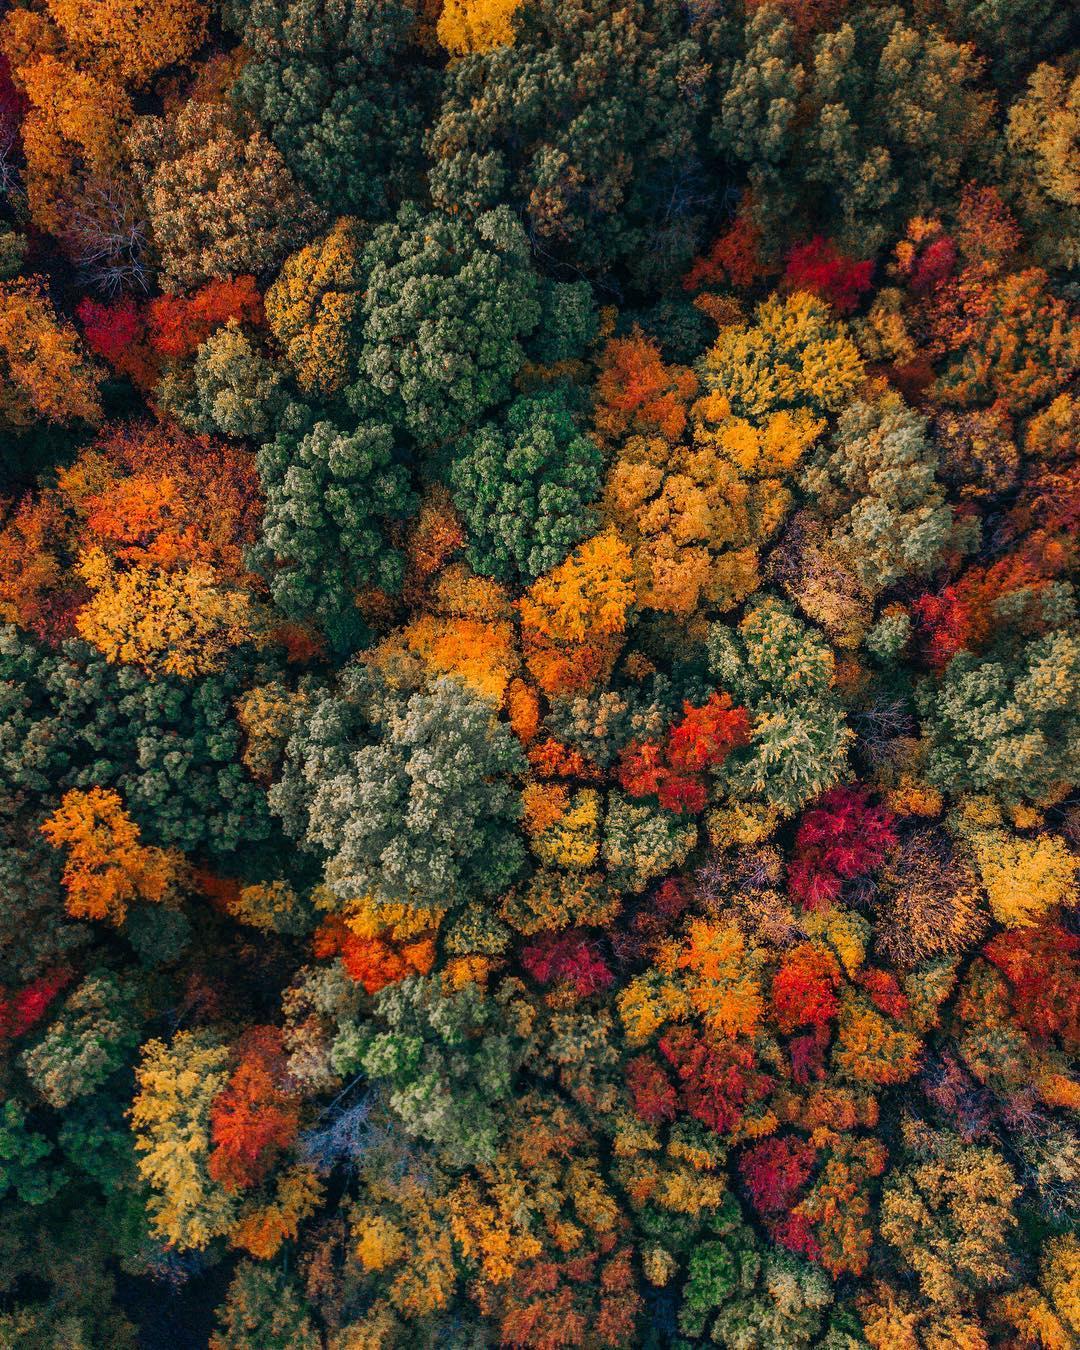 Martin Sanchez: 20 + Brilliant Photos Using A Drone